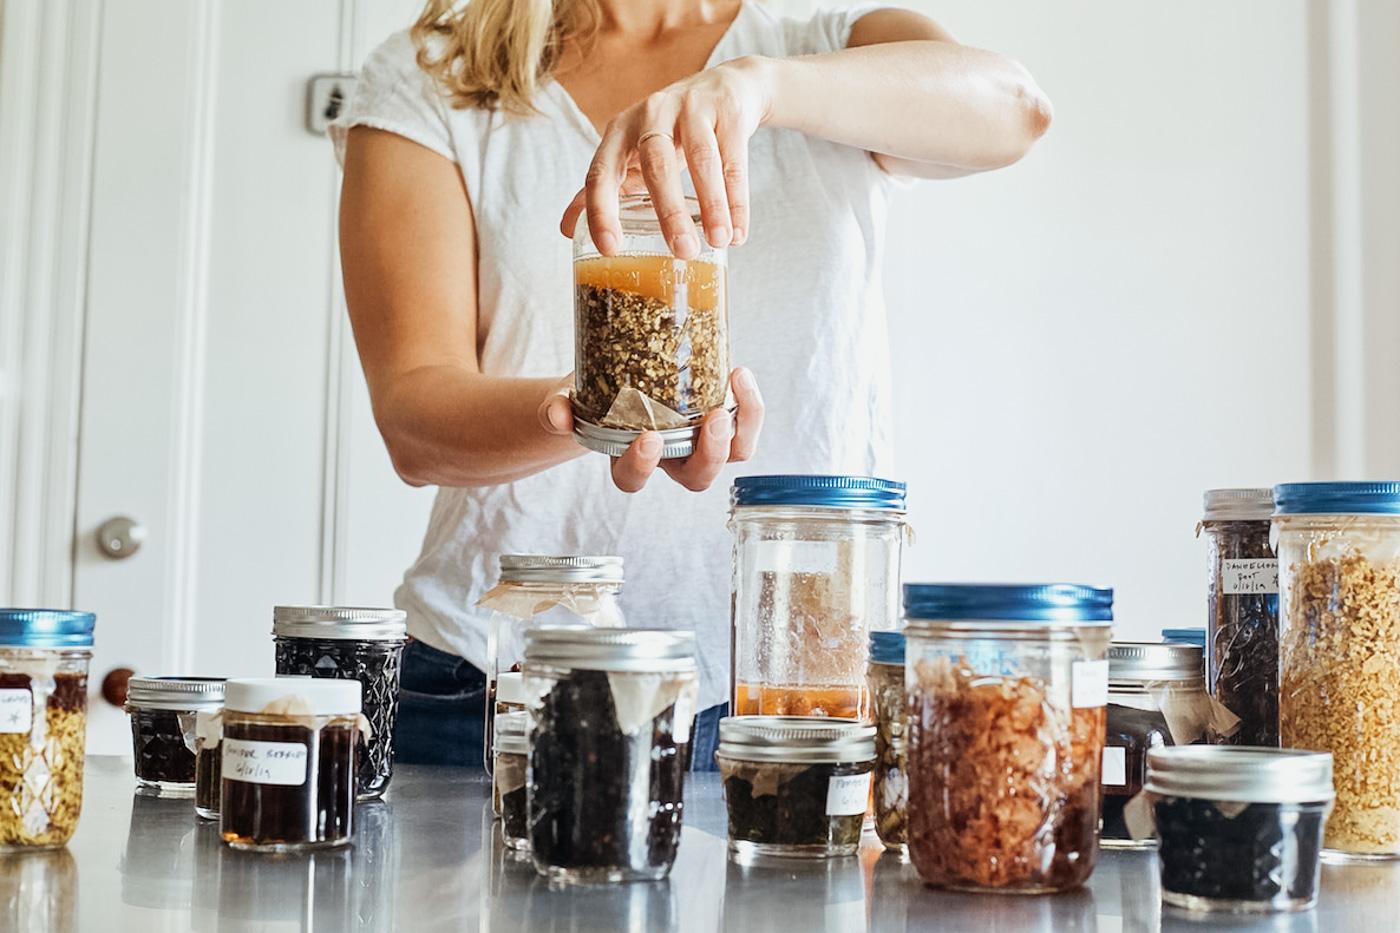 The Making Herbal Preparations Course by Herbal Academy –herbal preparation